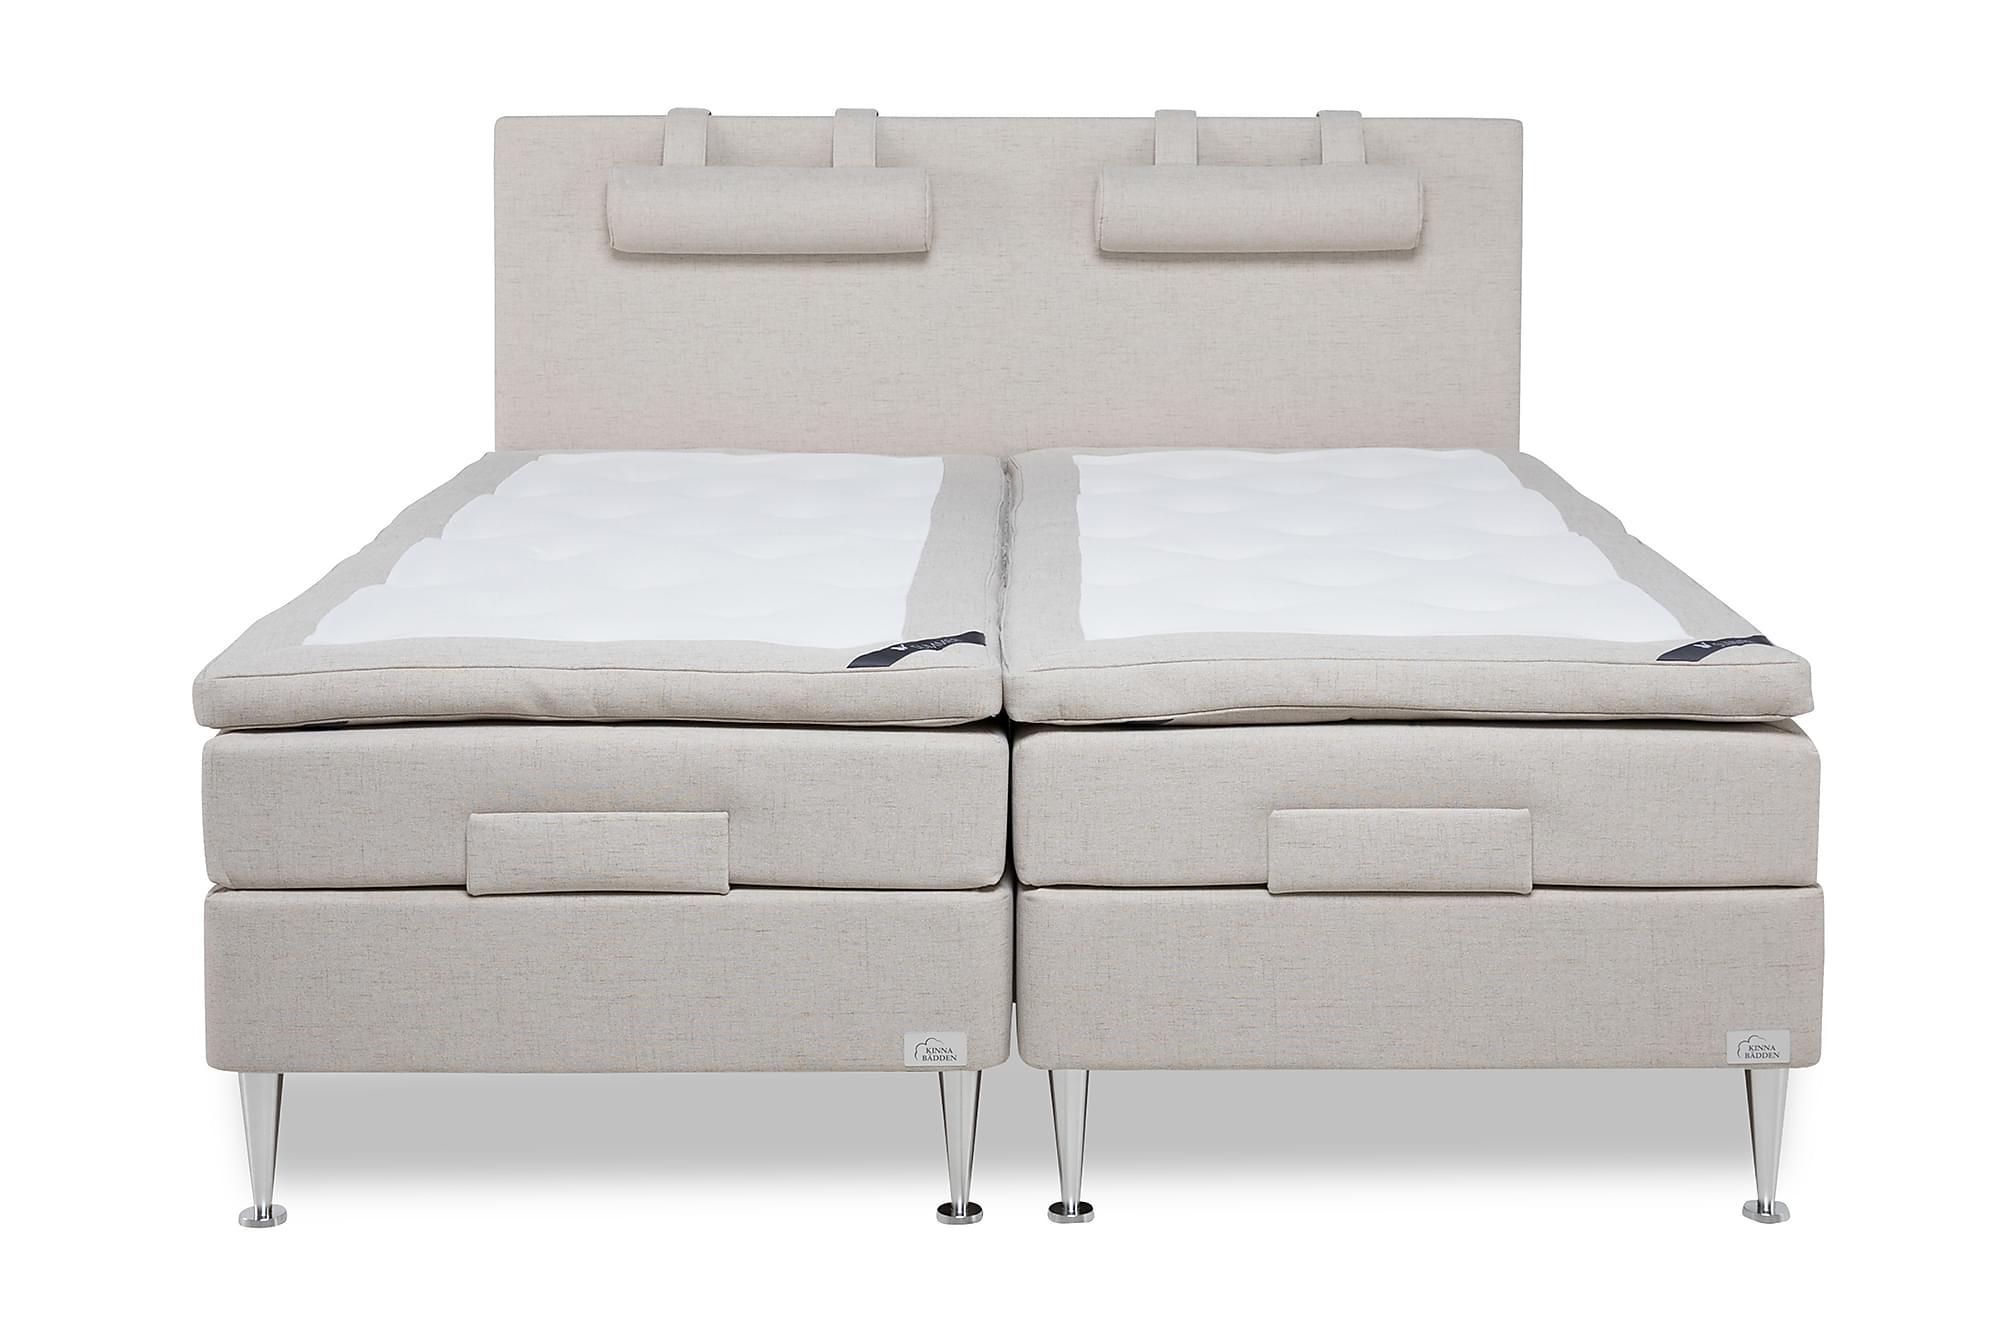 KINNABÄDDEN SAFIR Ställbar Säng 180x200 F Latex 60 mm Gavel, Ställbara sängar